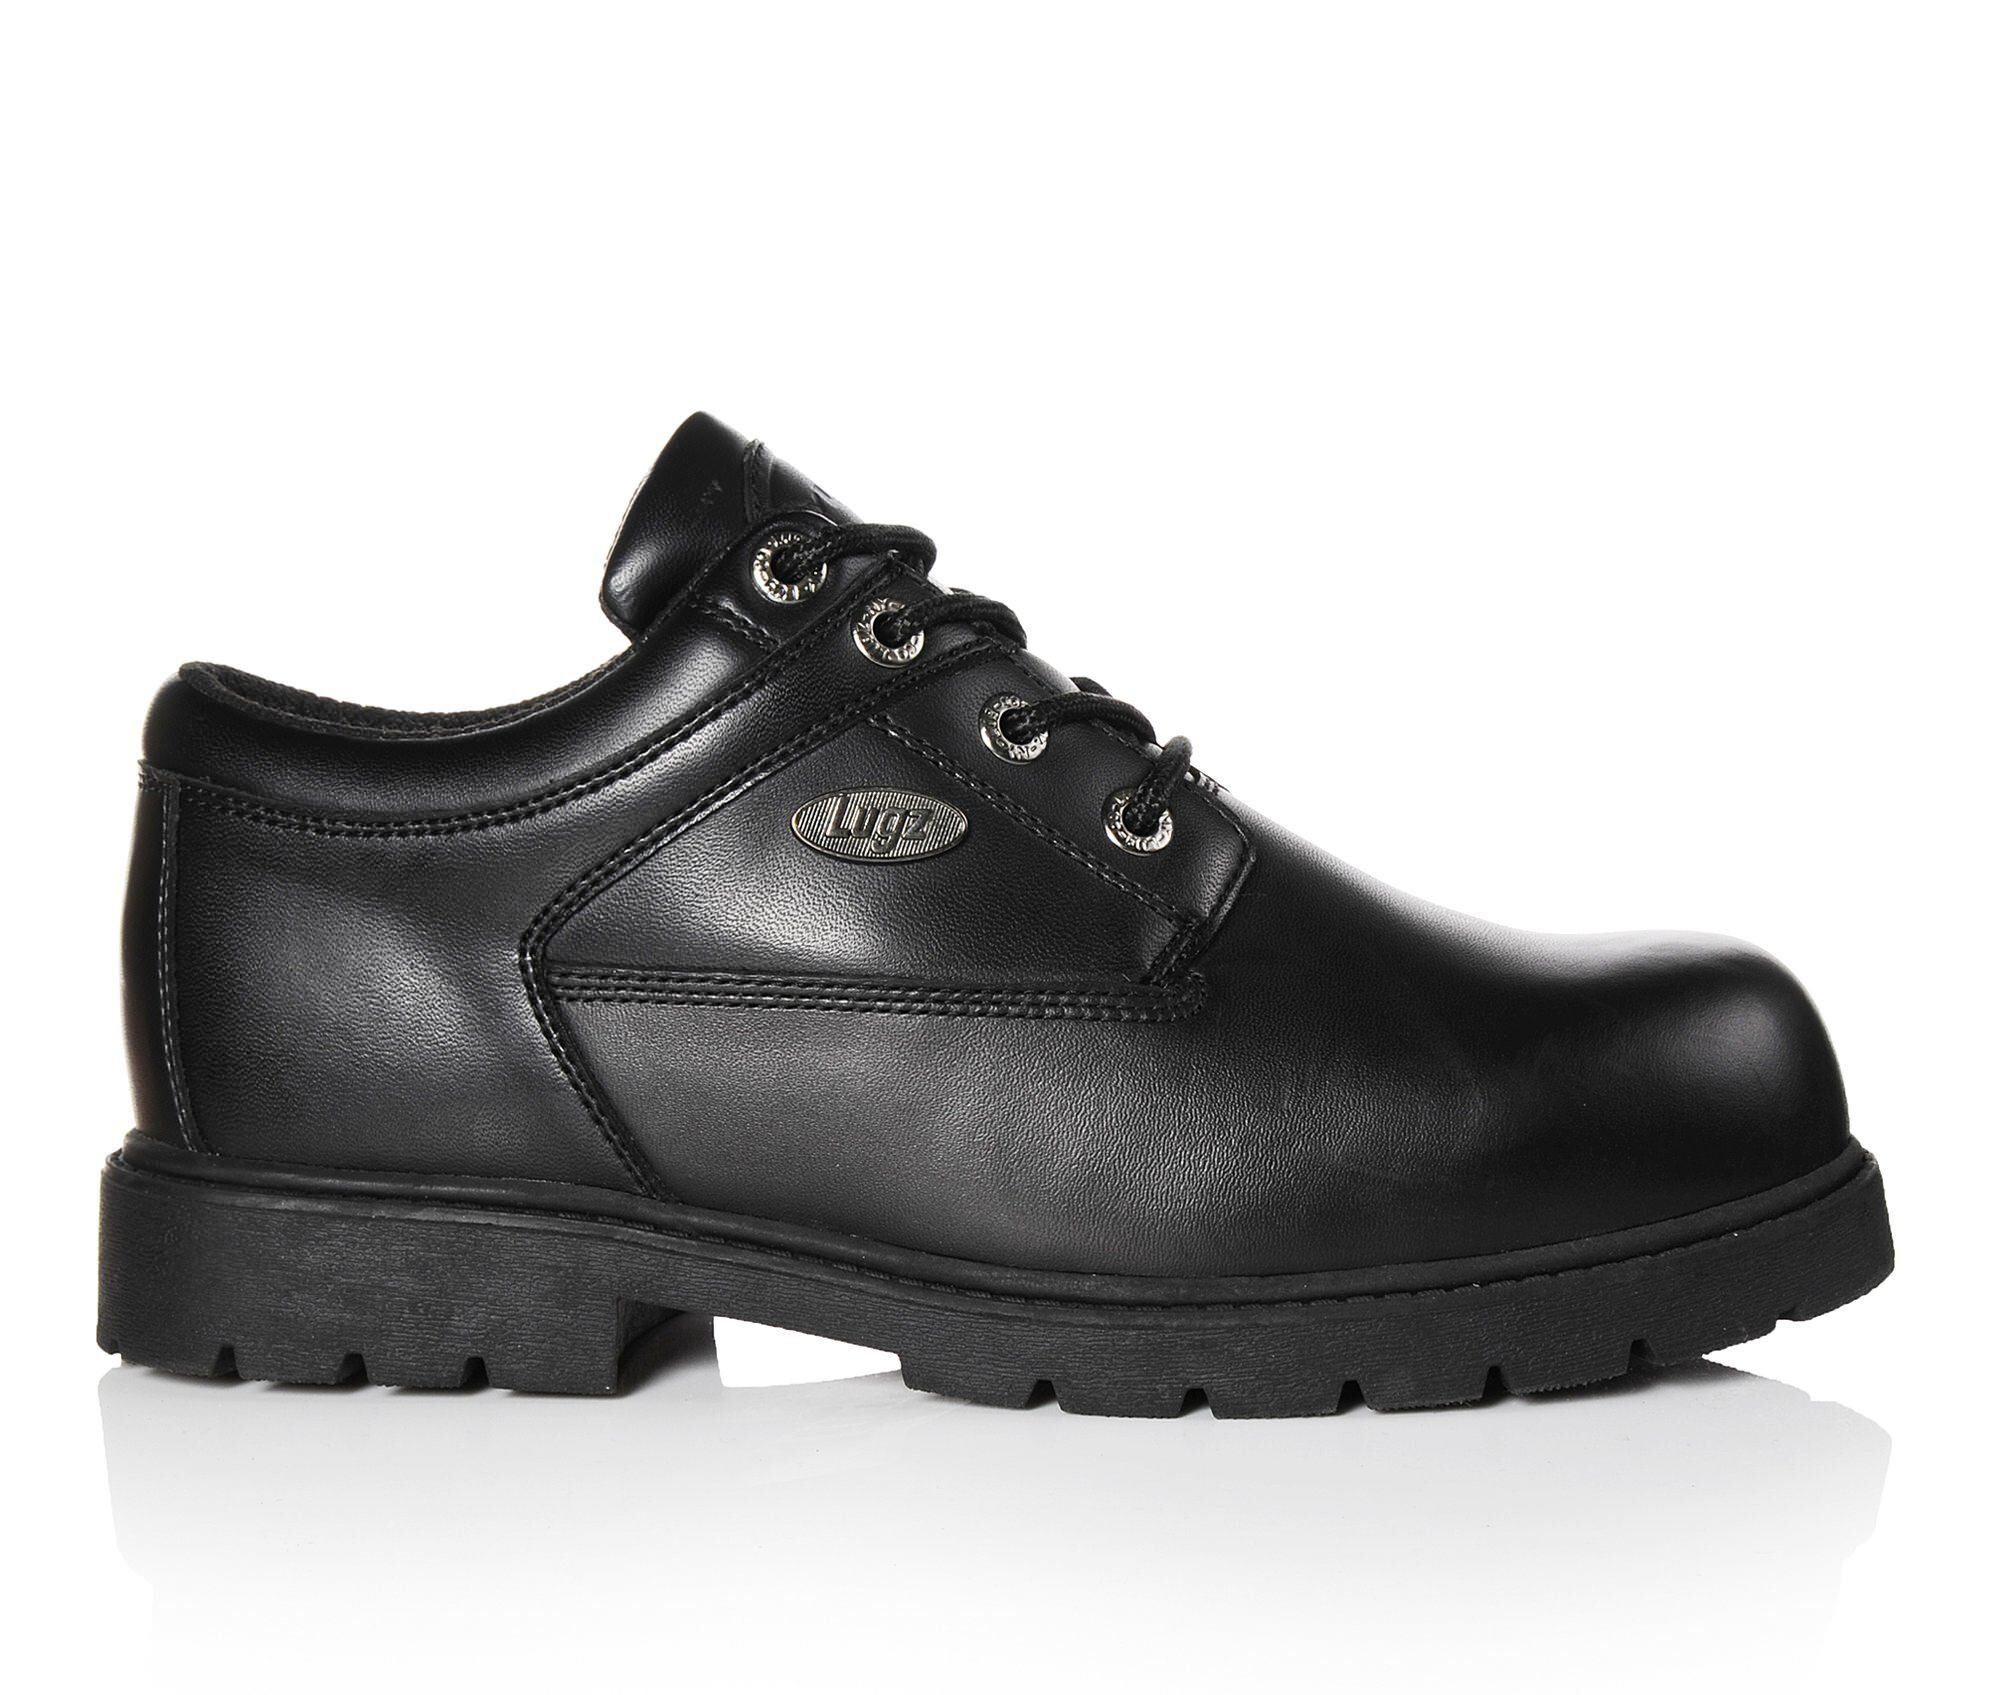 uk shoes_kd2419